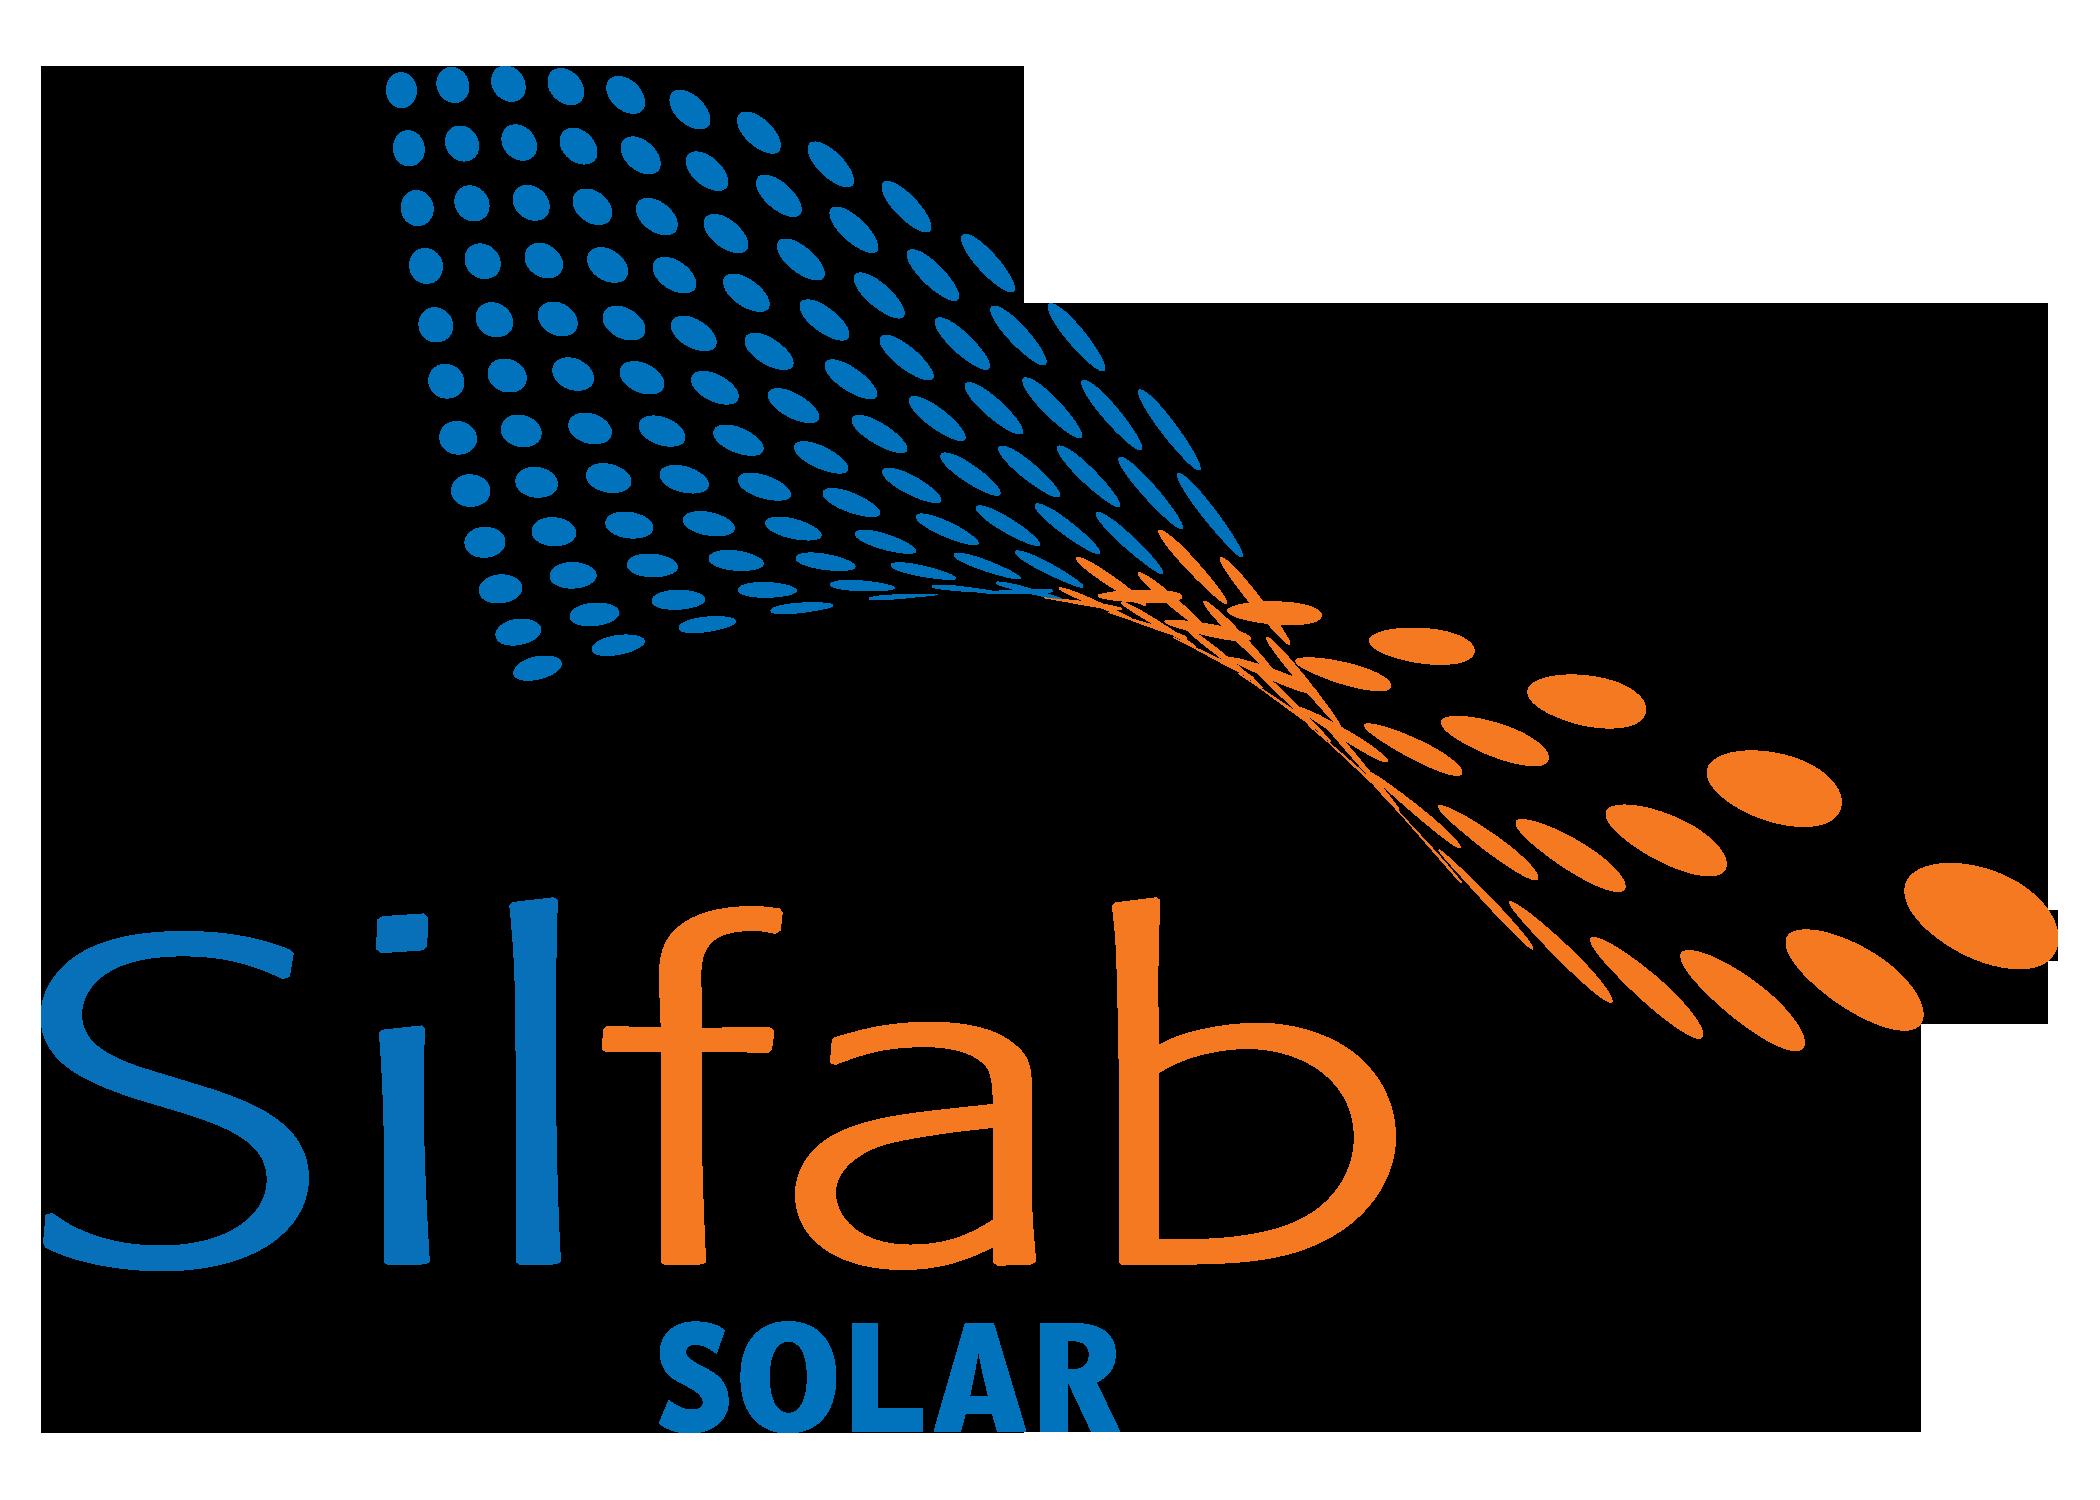 SILFAB-SOLAR-LOGO_RGB_WB_Trans.png